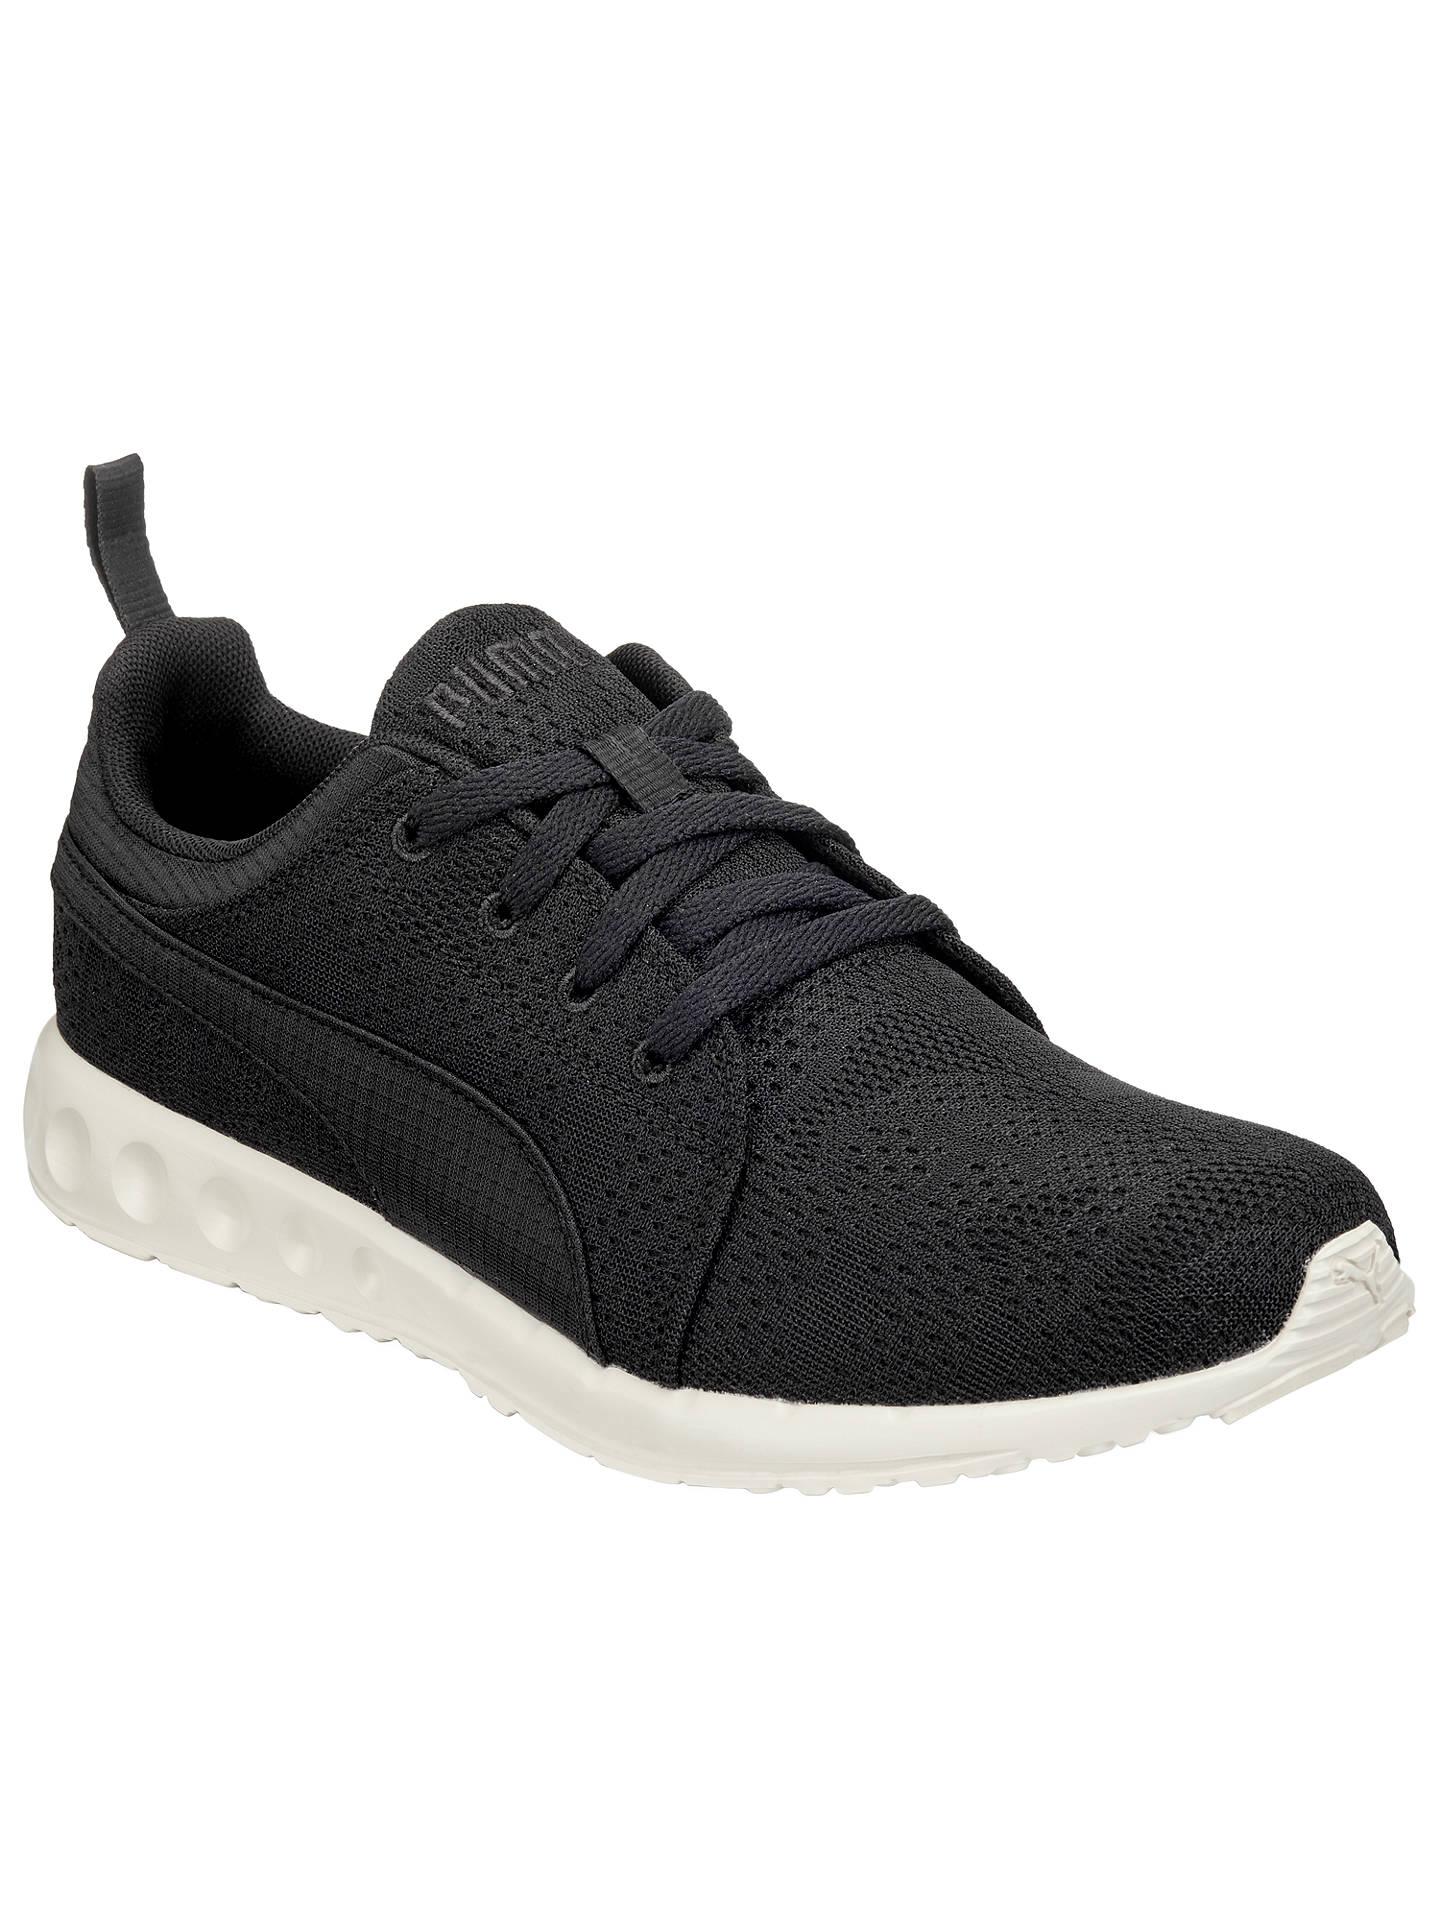 2835194b4d0 Puma Carson Men s Running Shoes at John Lewis   Partners